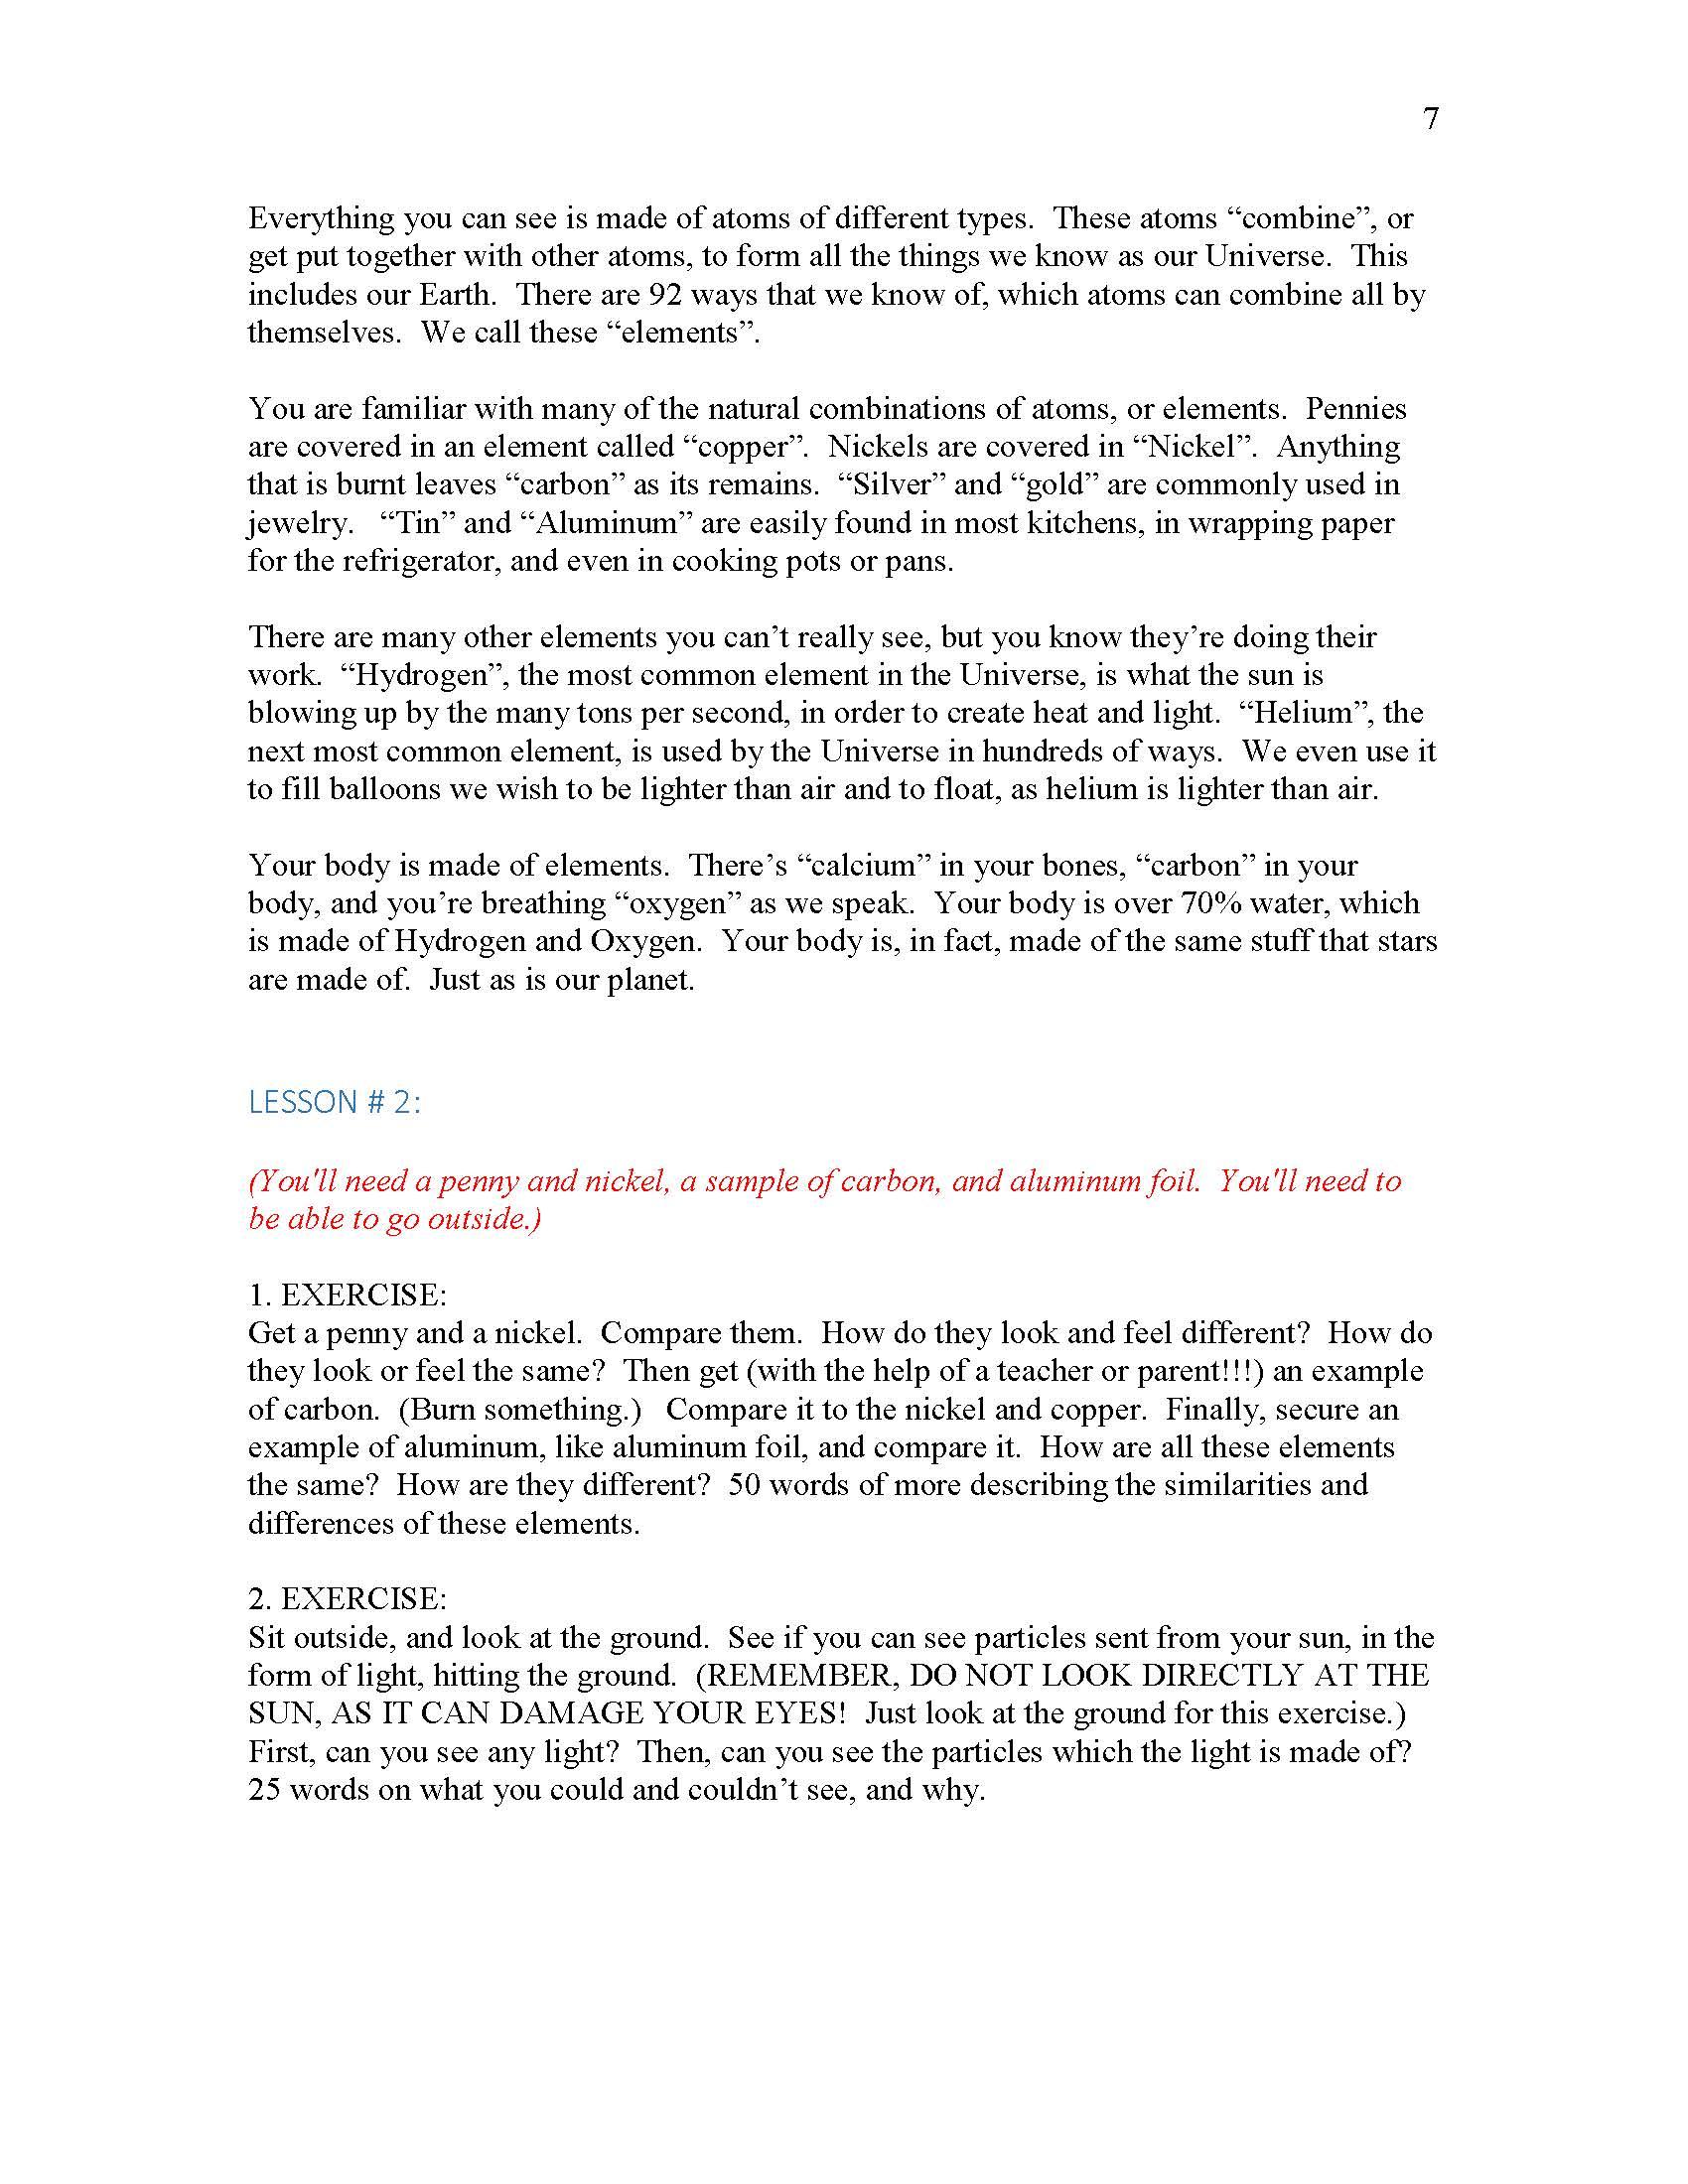 Step 3 Science 2 - Earth Sciences_Page_08.jpg